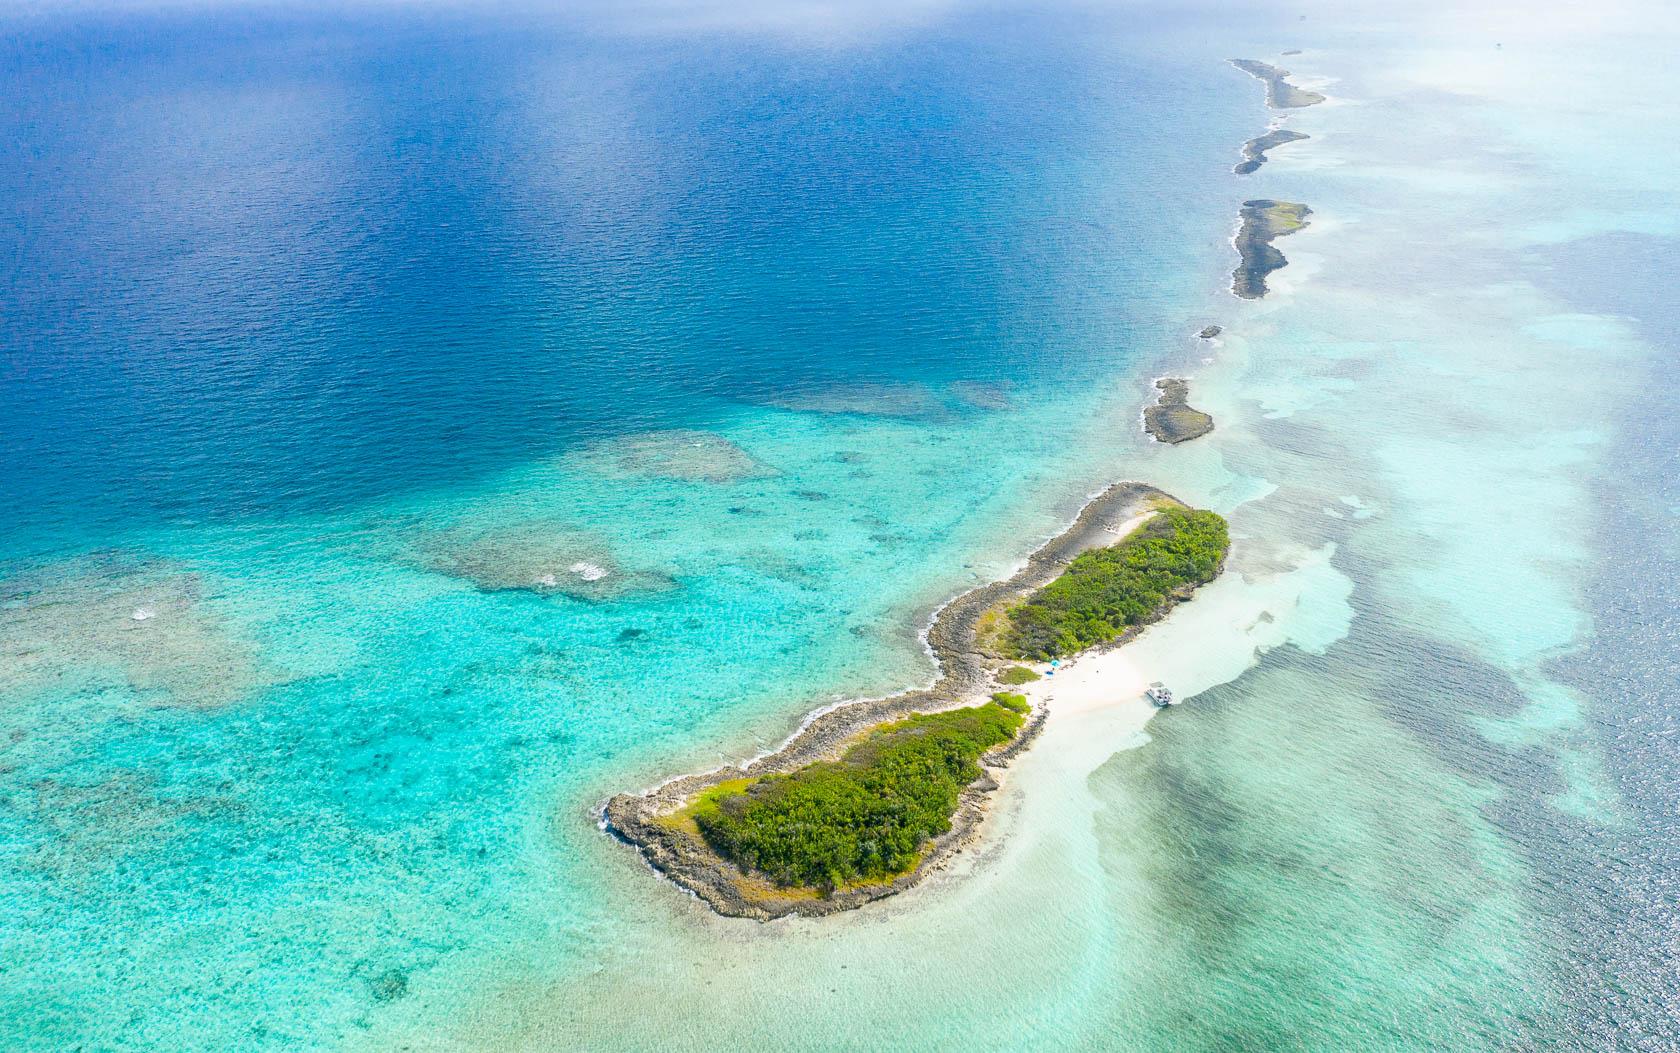 Isola St.Andrews Bahamas: in vendita a circa 19 milioni di dollari!